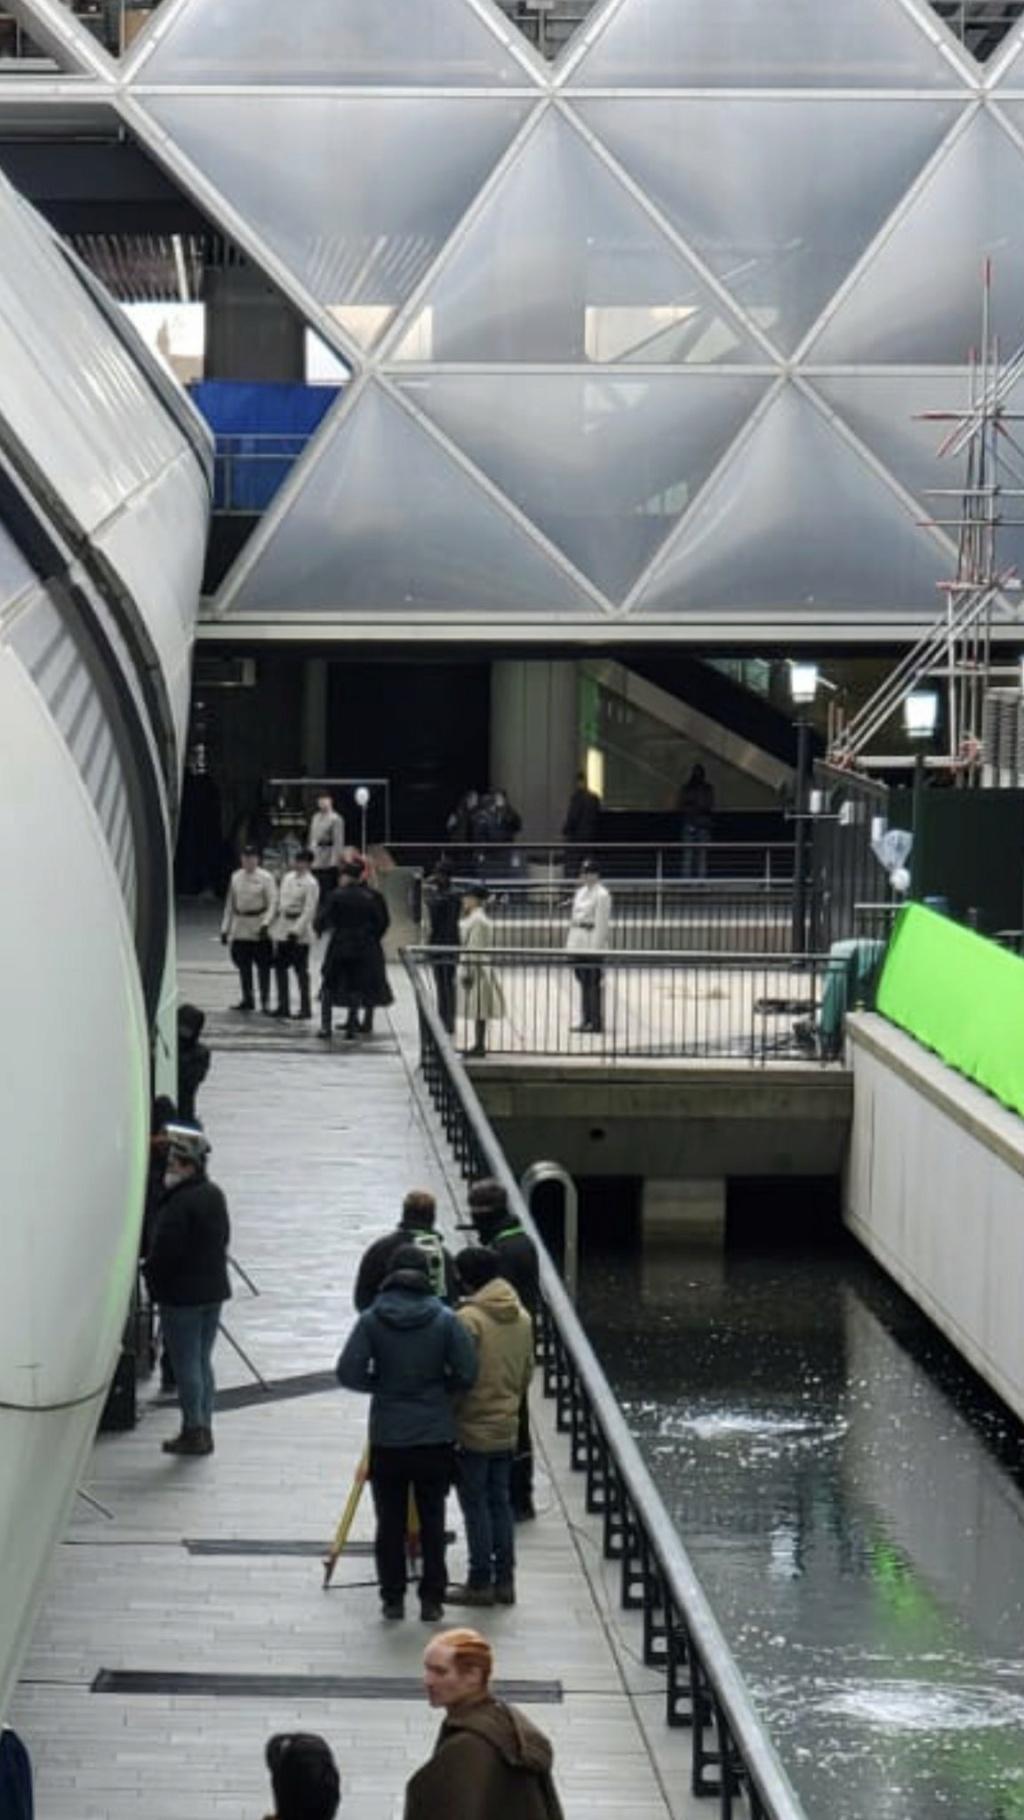 Star Wars Andor : Les RUMEURS de la série (POSSIBLE SPOILER) Canary10